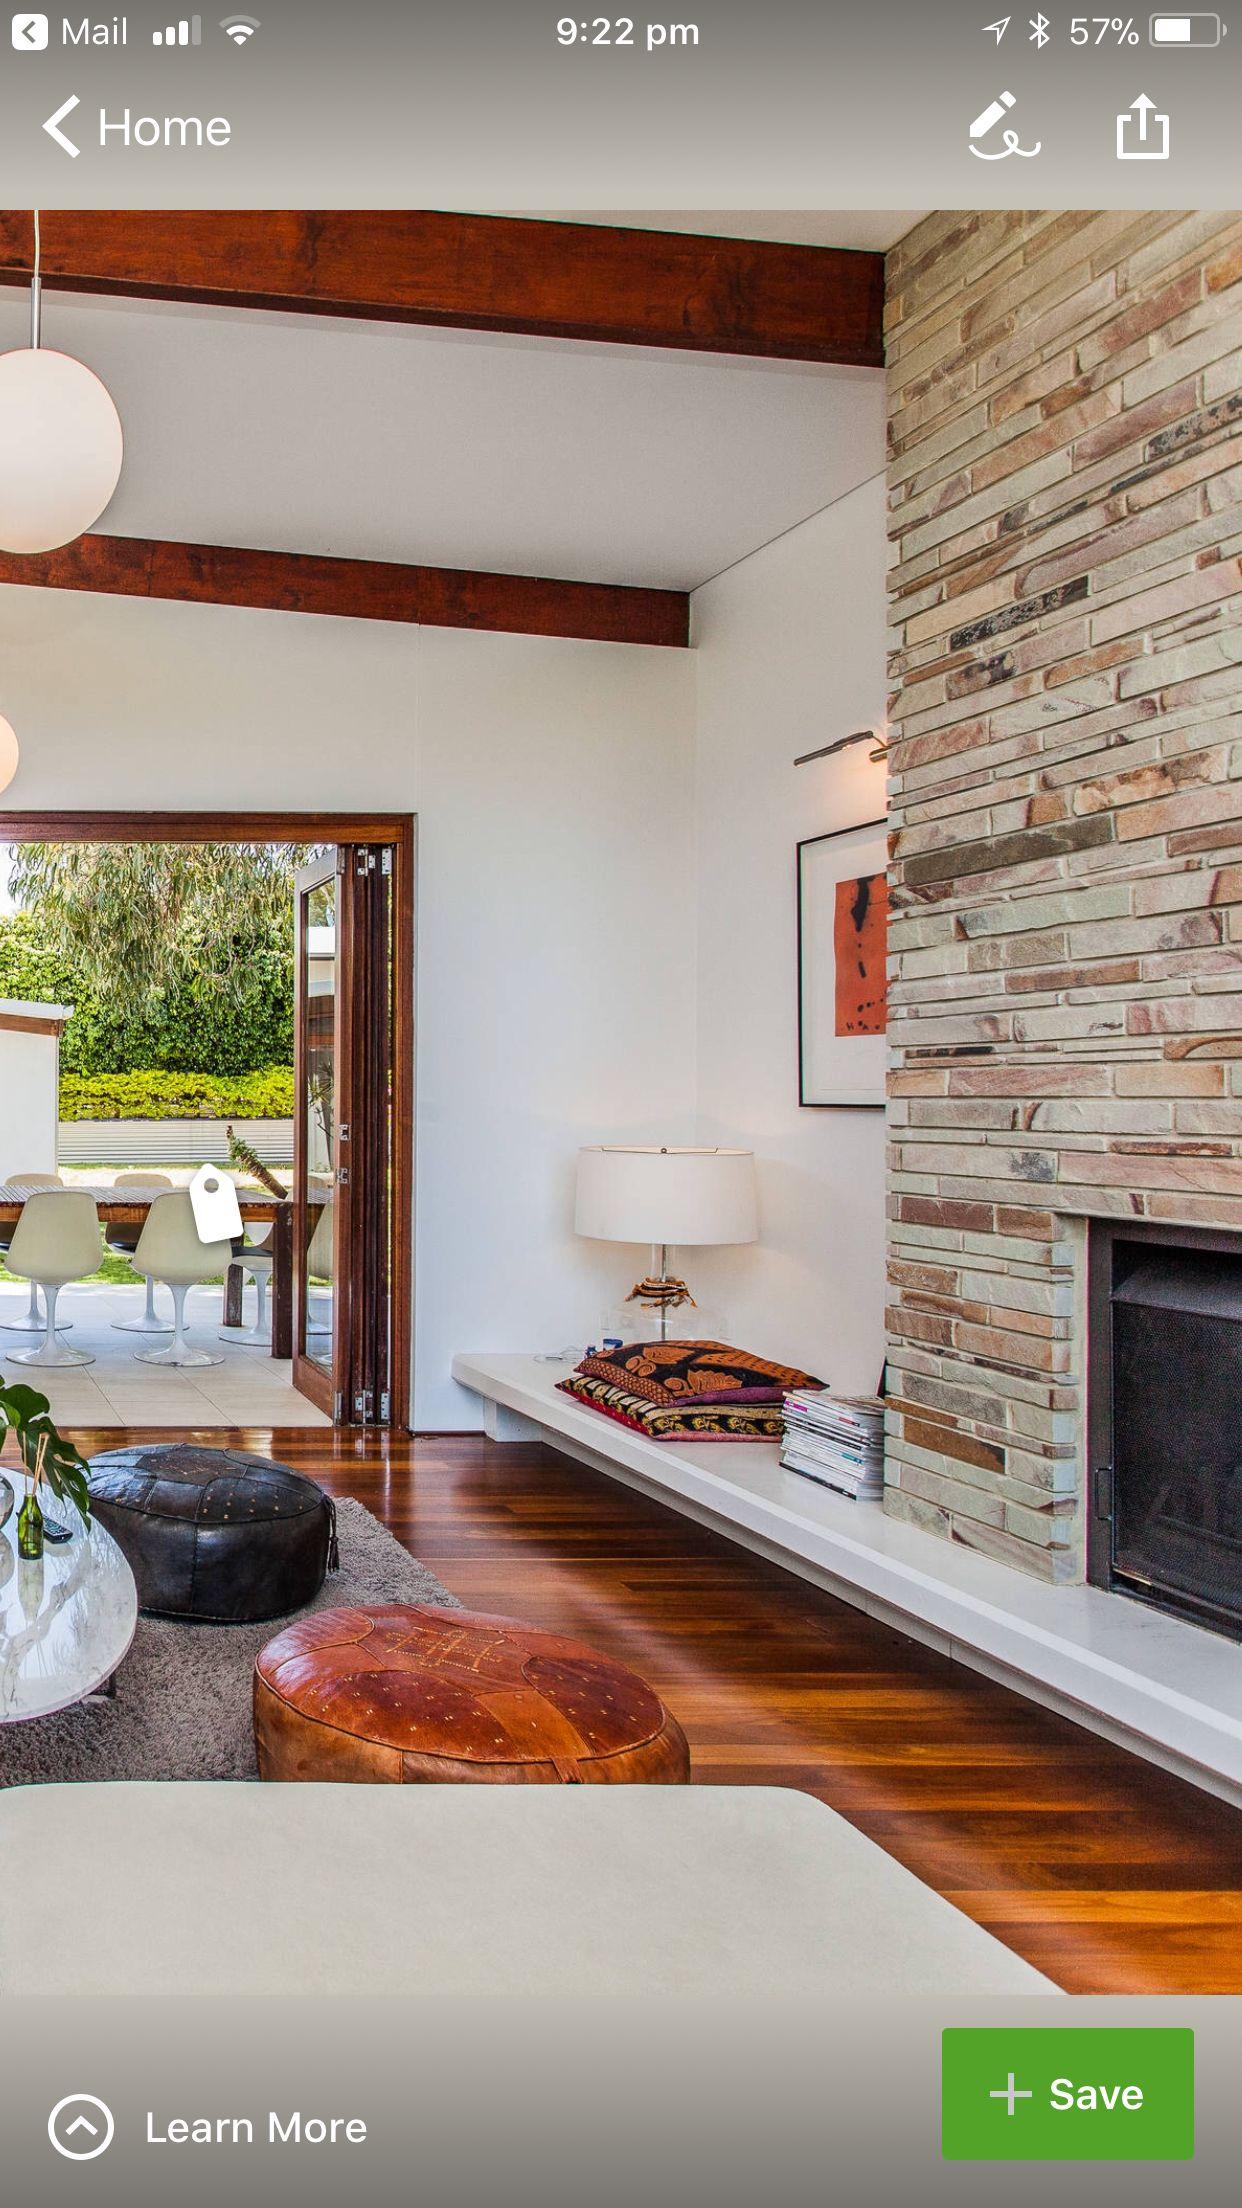 Home interior ideas for apartments pin by p kay mm on cozy coastal home  pinterest  coastal cozy